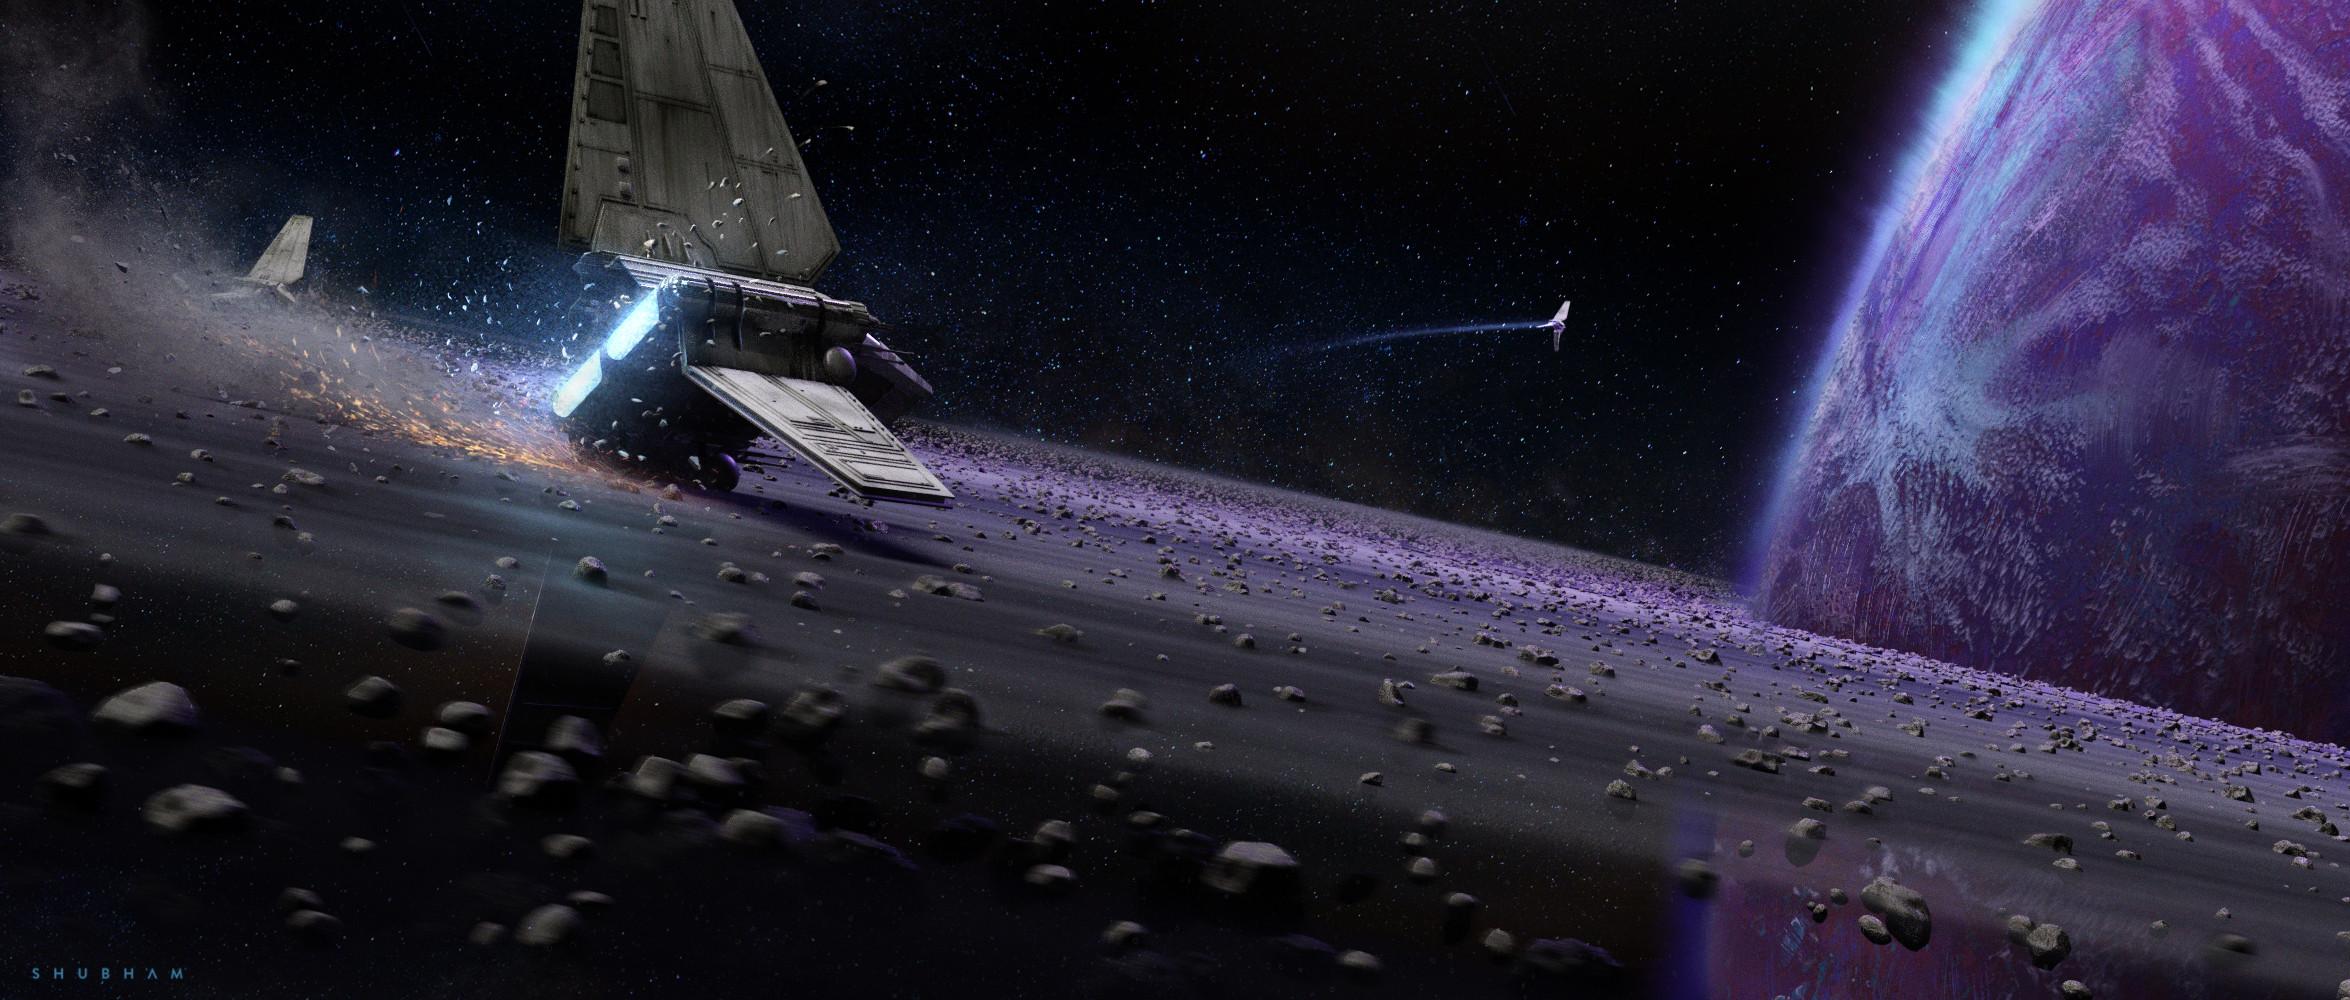 shubham-lakhotia-asteroid-belt.jpg?16052